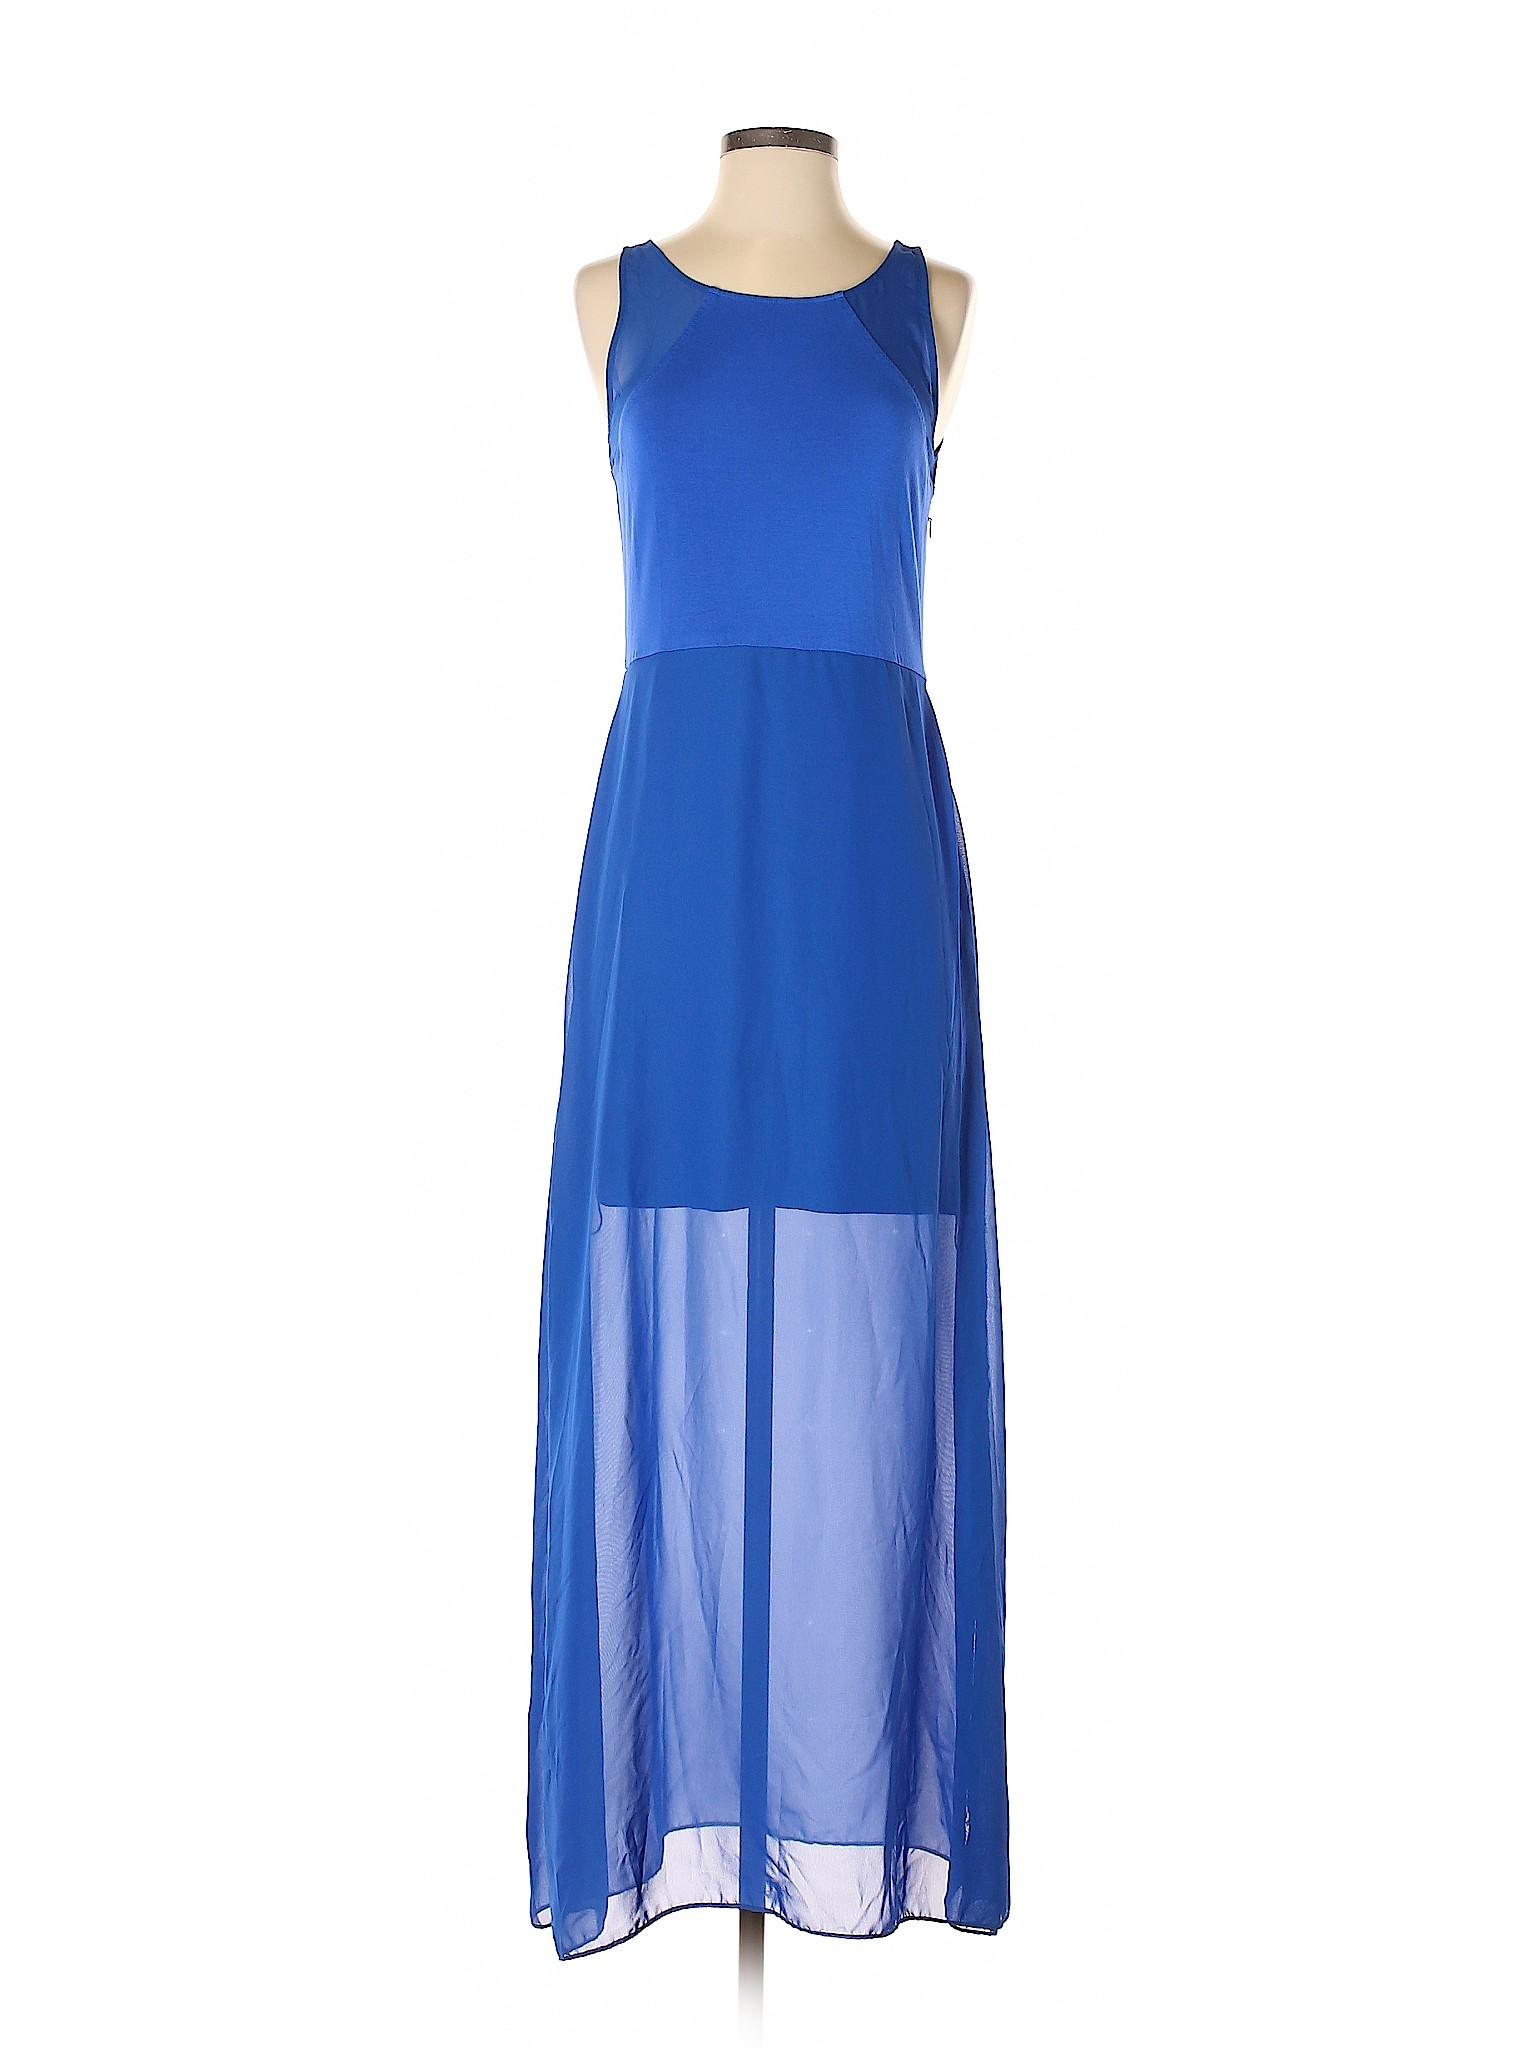 518860d27bd Details about Gianni Bini Women Blue Casual Dress Sm